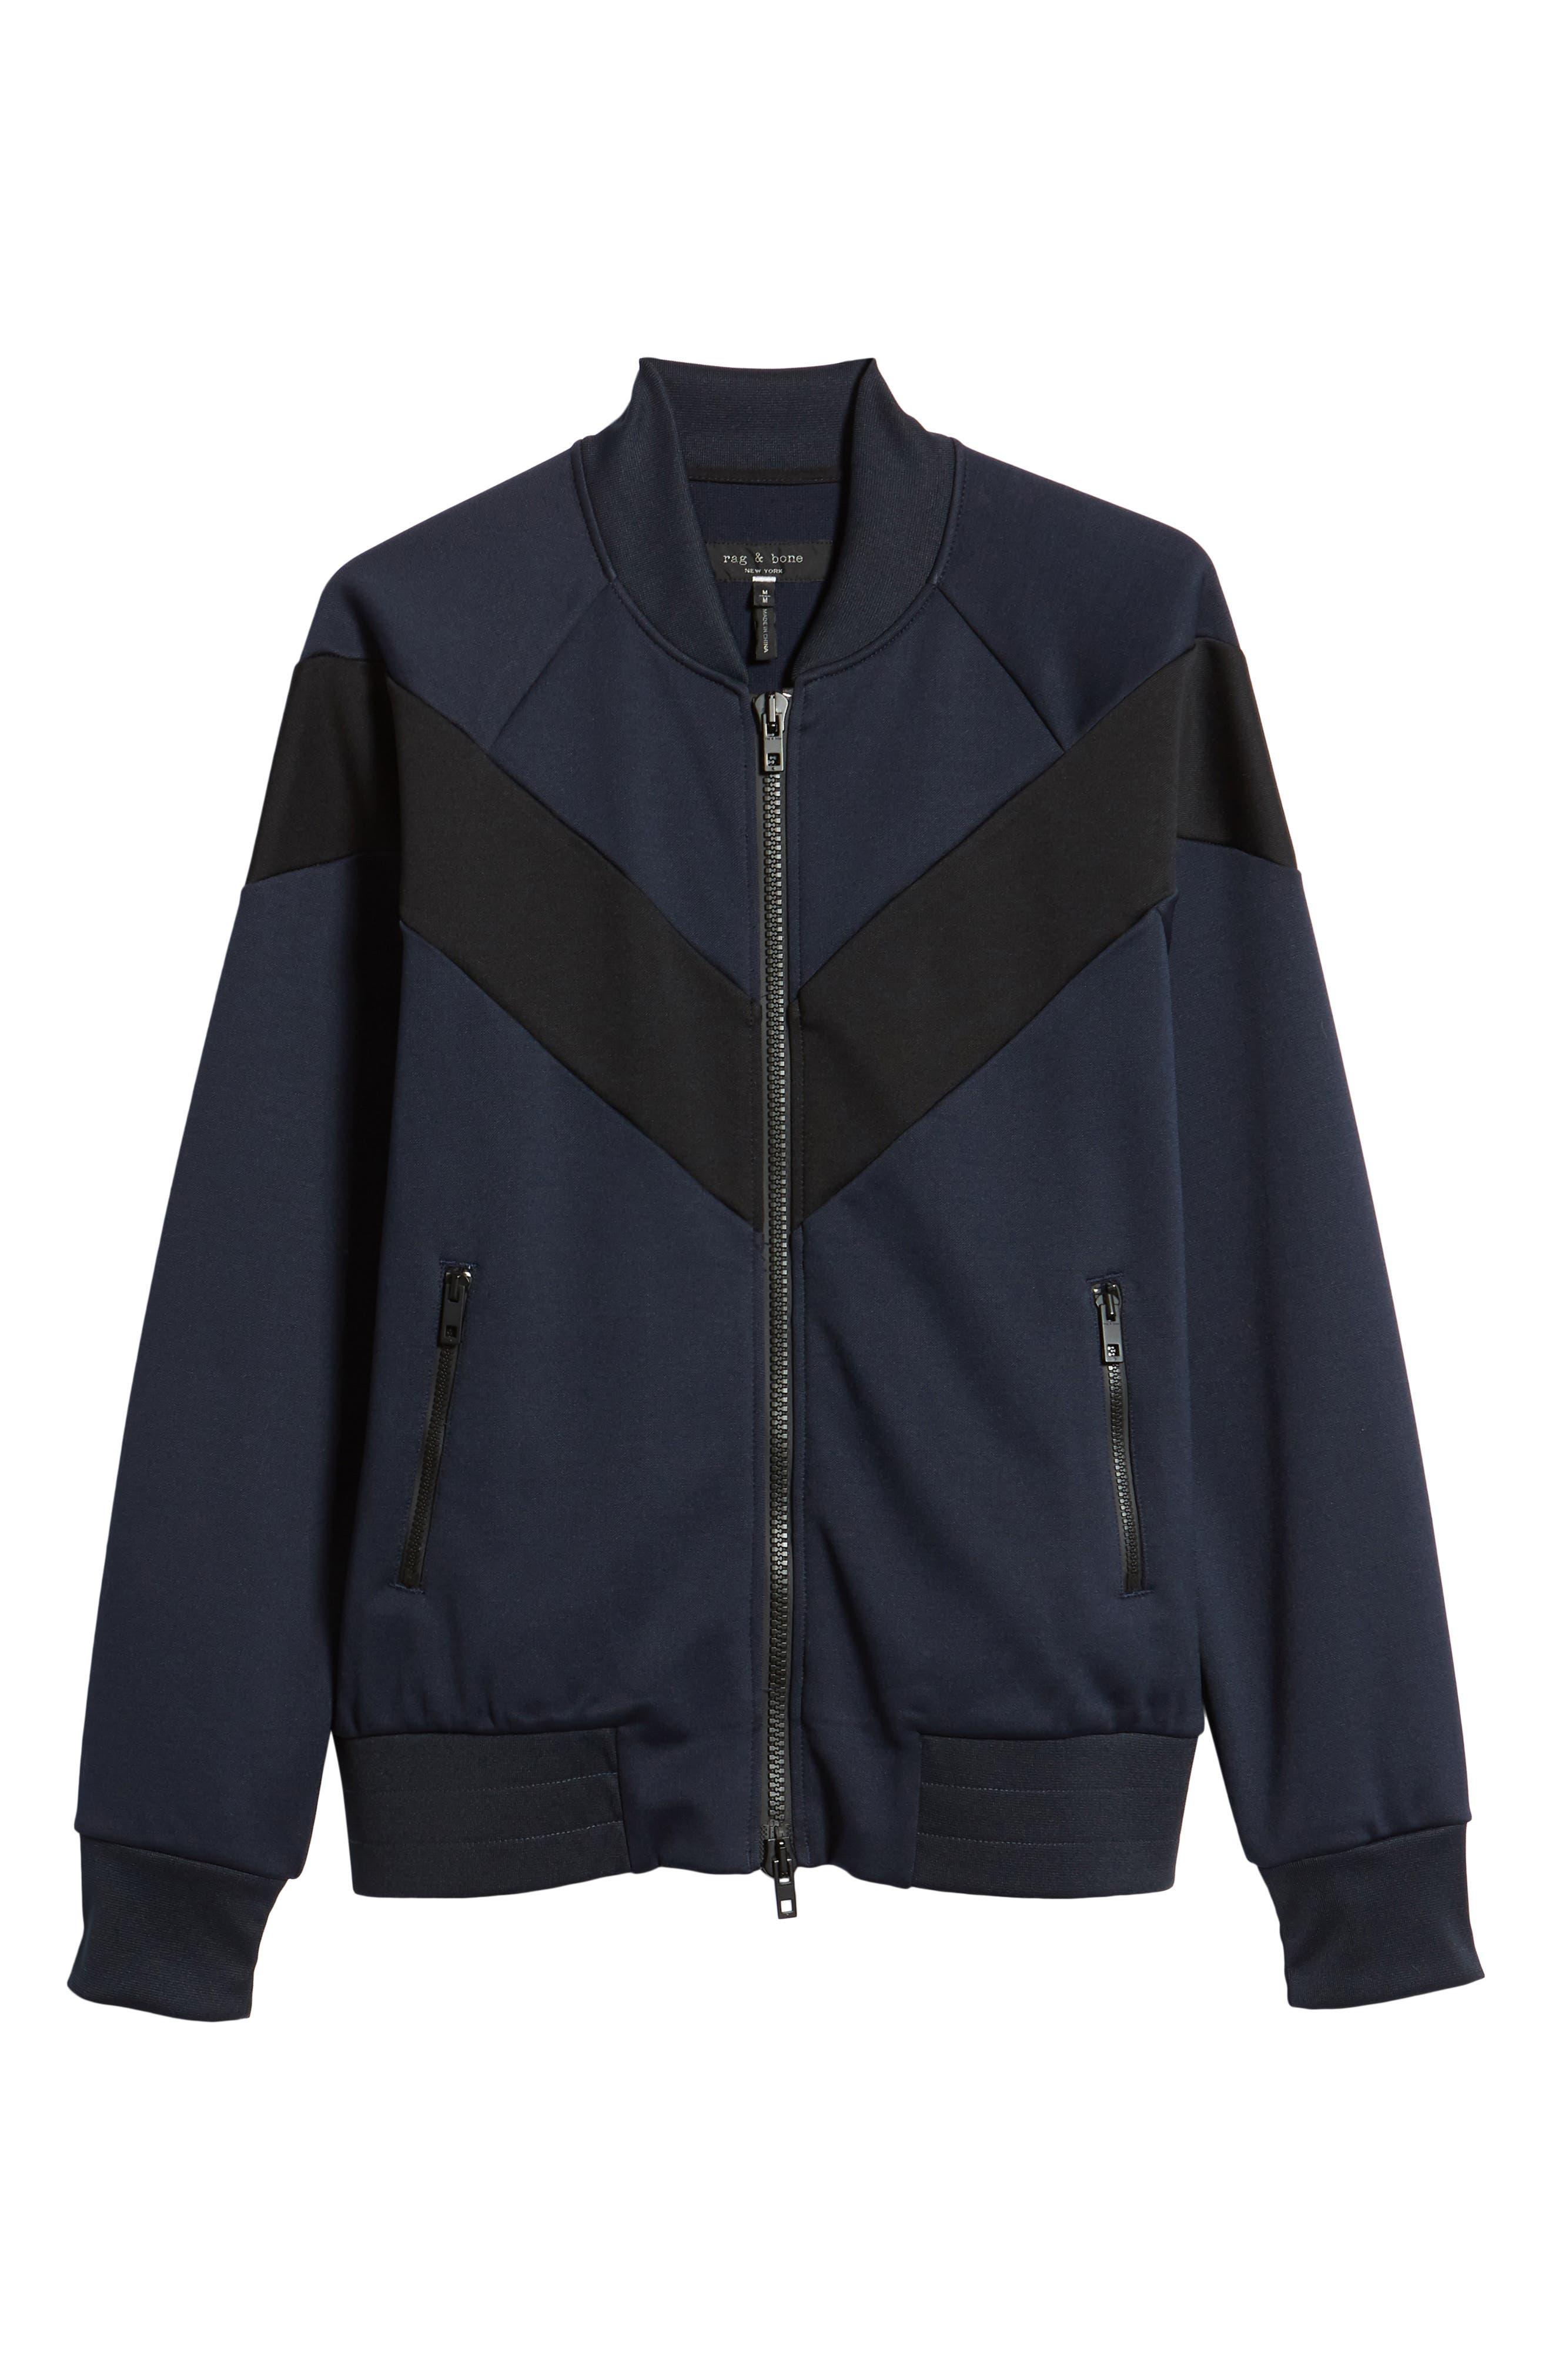 Colorblock Slim Fit Bomber Jacket,                             Alternate thumbnail 5, color,                             NAVY/ BLACK